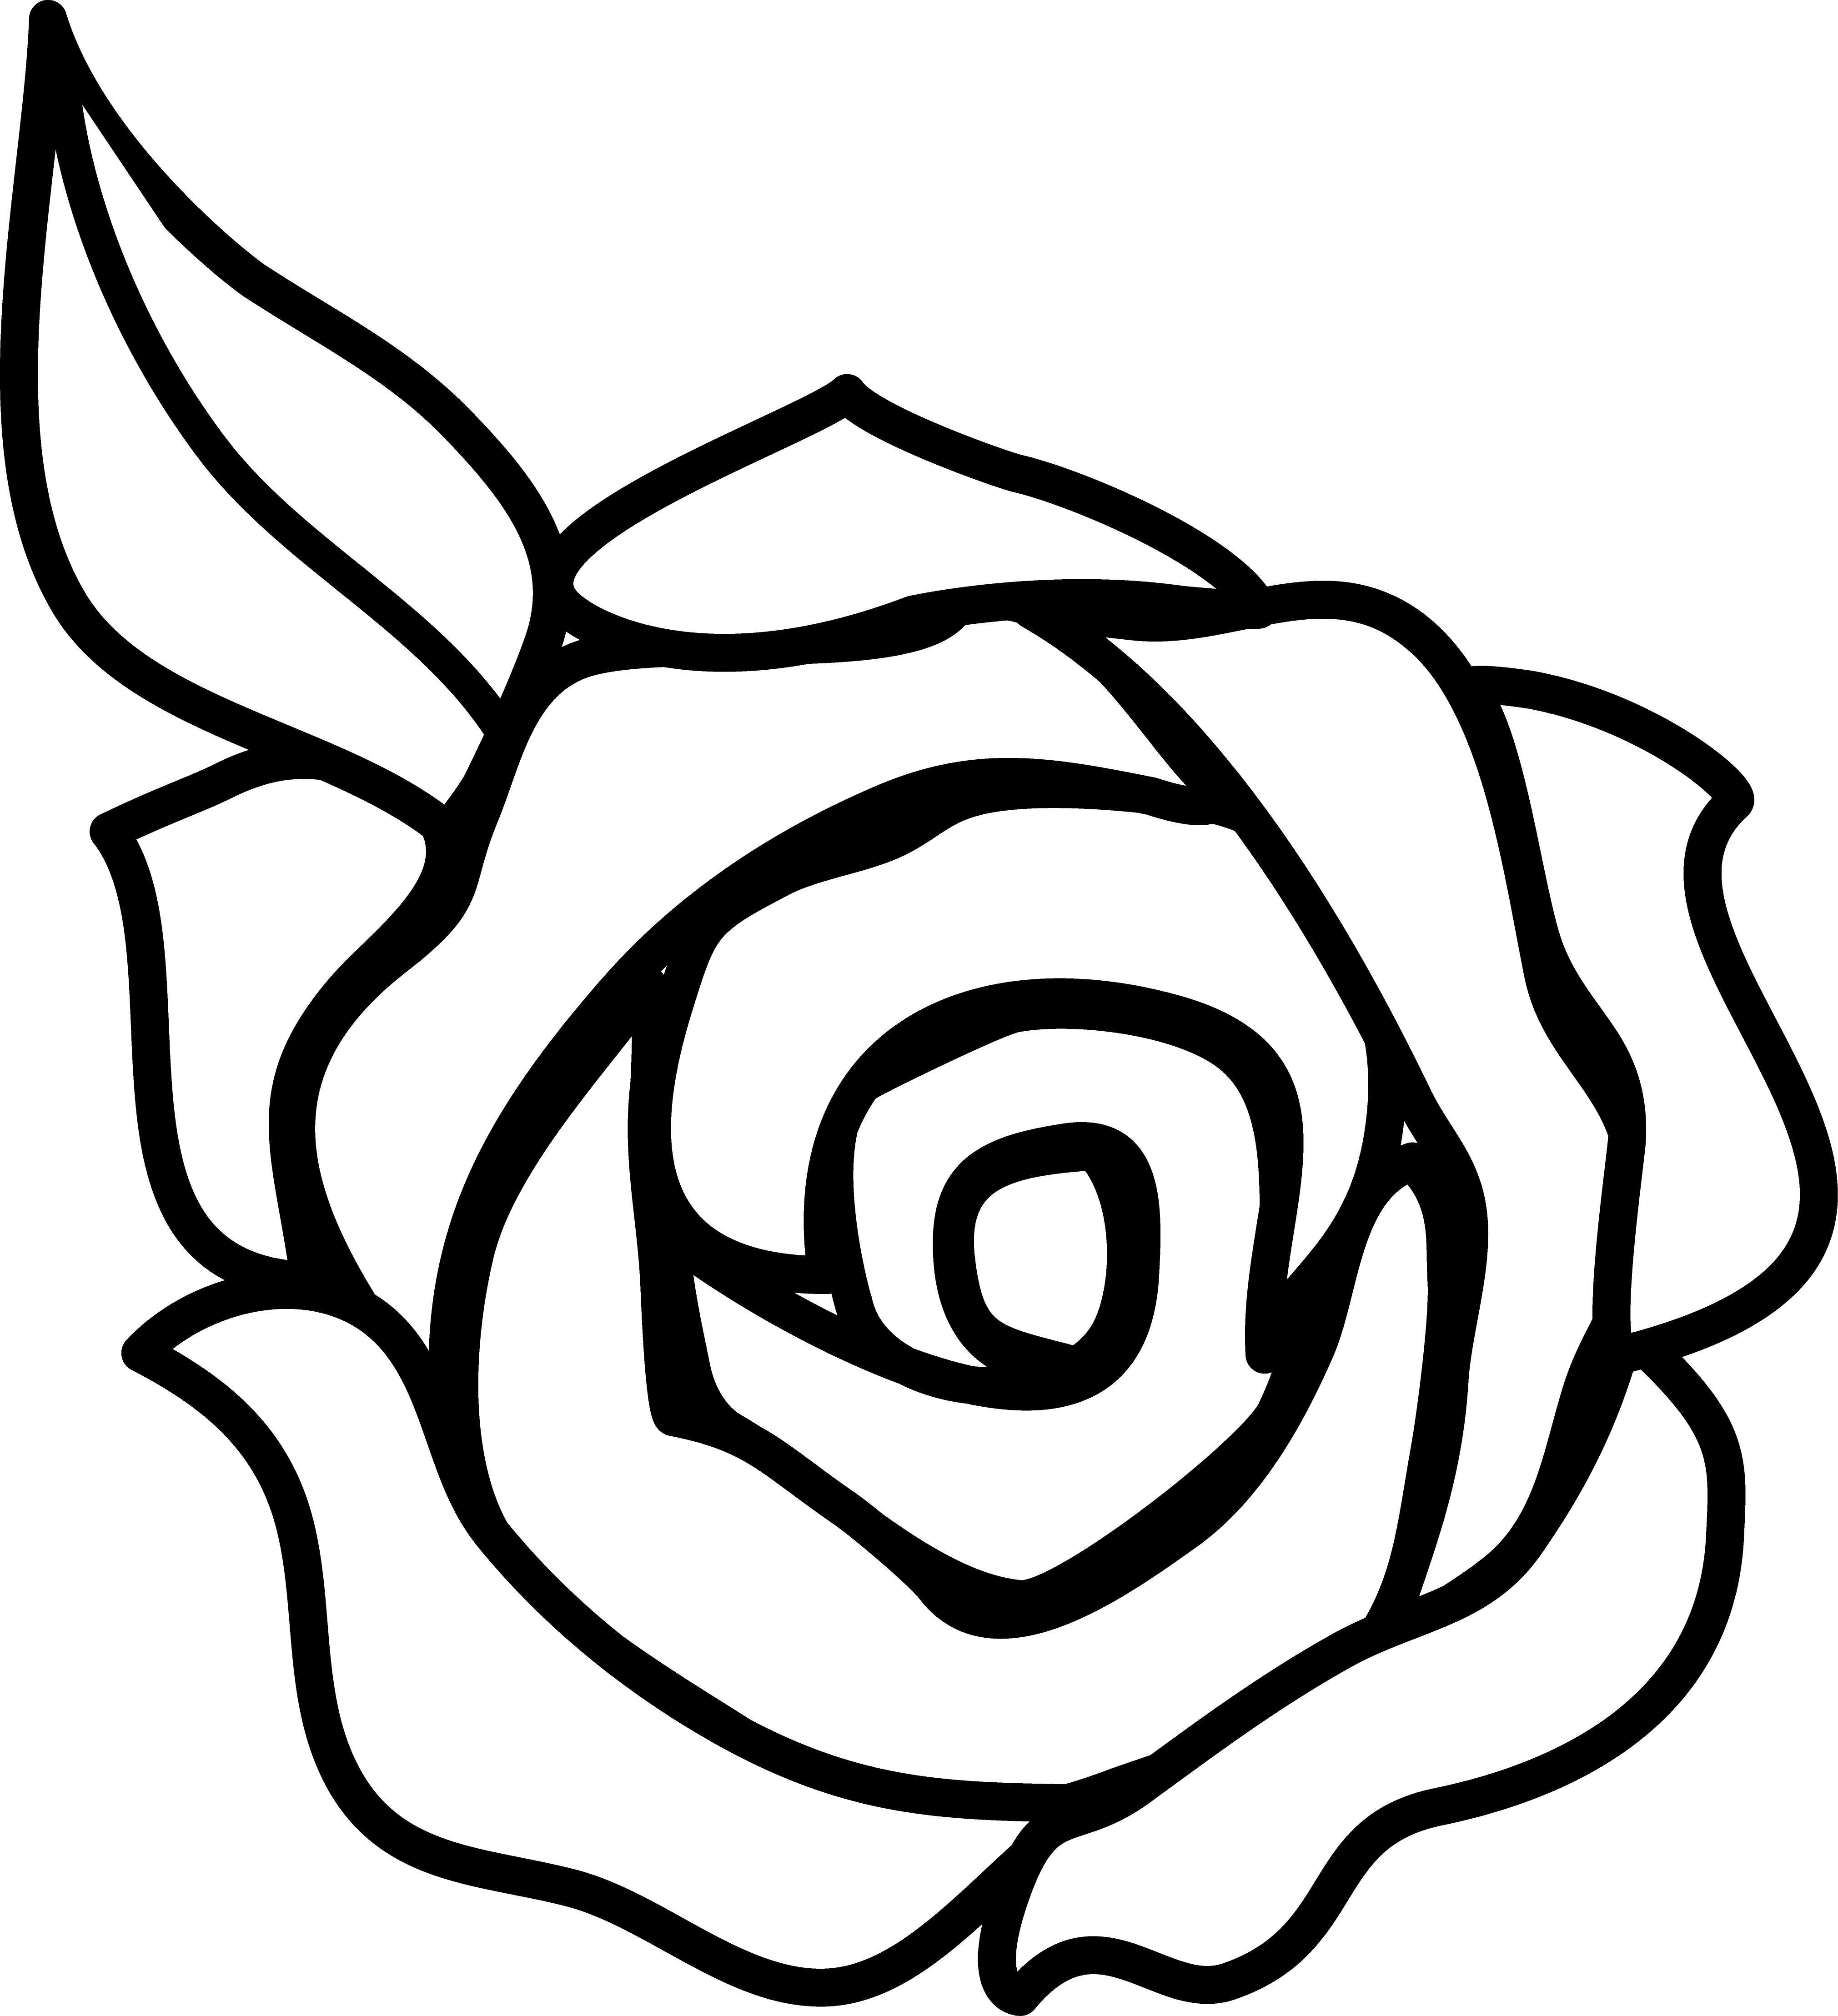 4042x4434 Black And White Rose Border Clip Art Clipart Panda